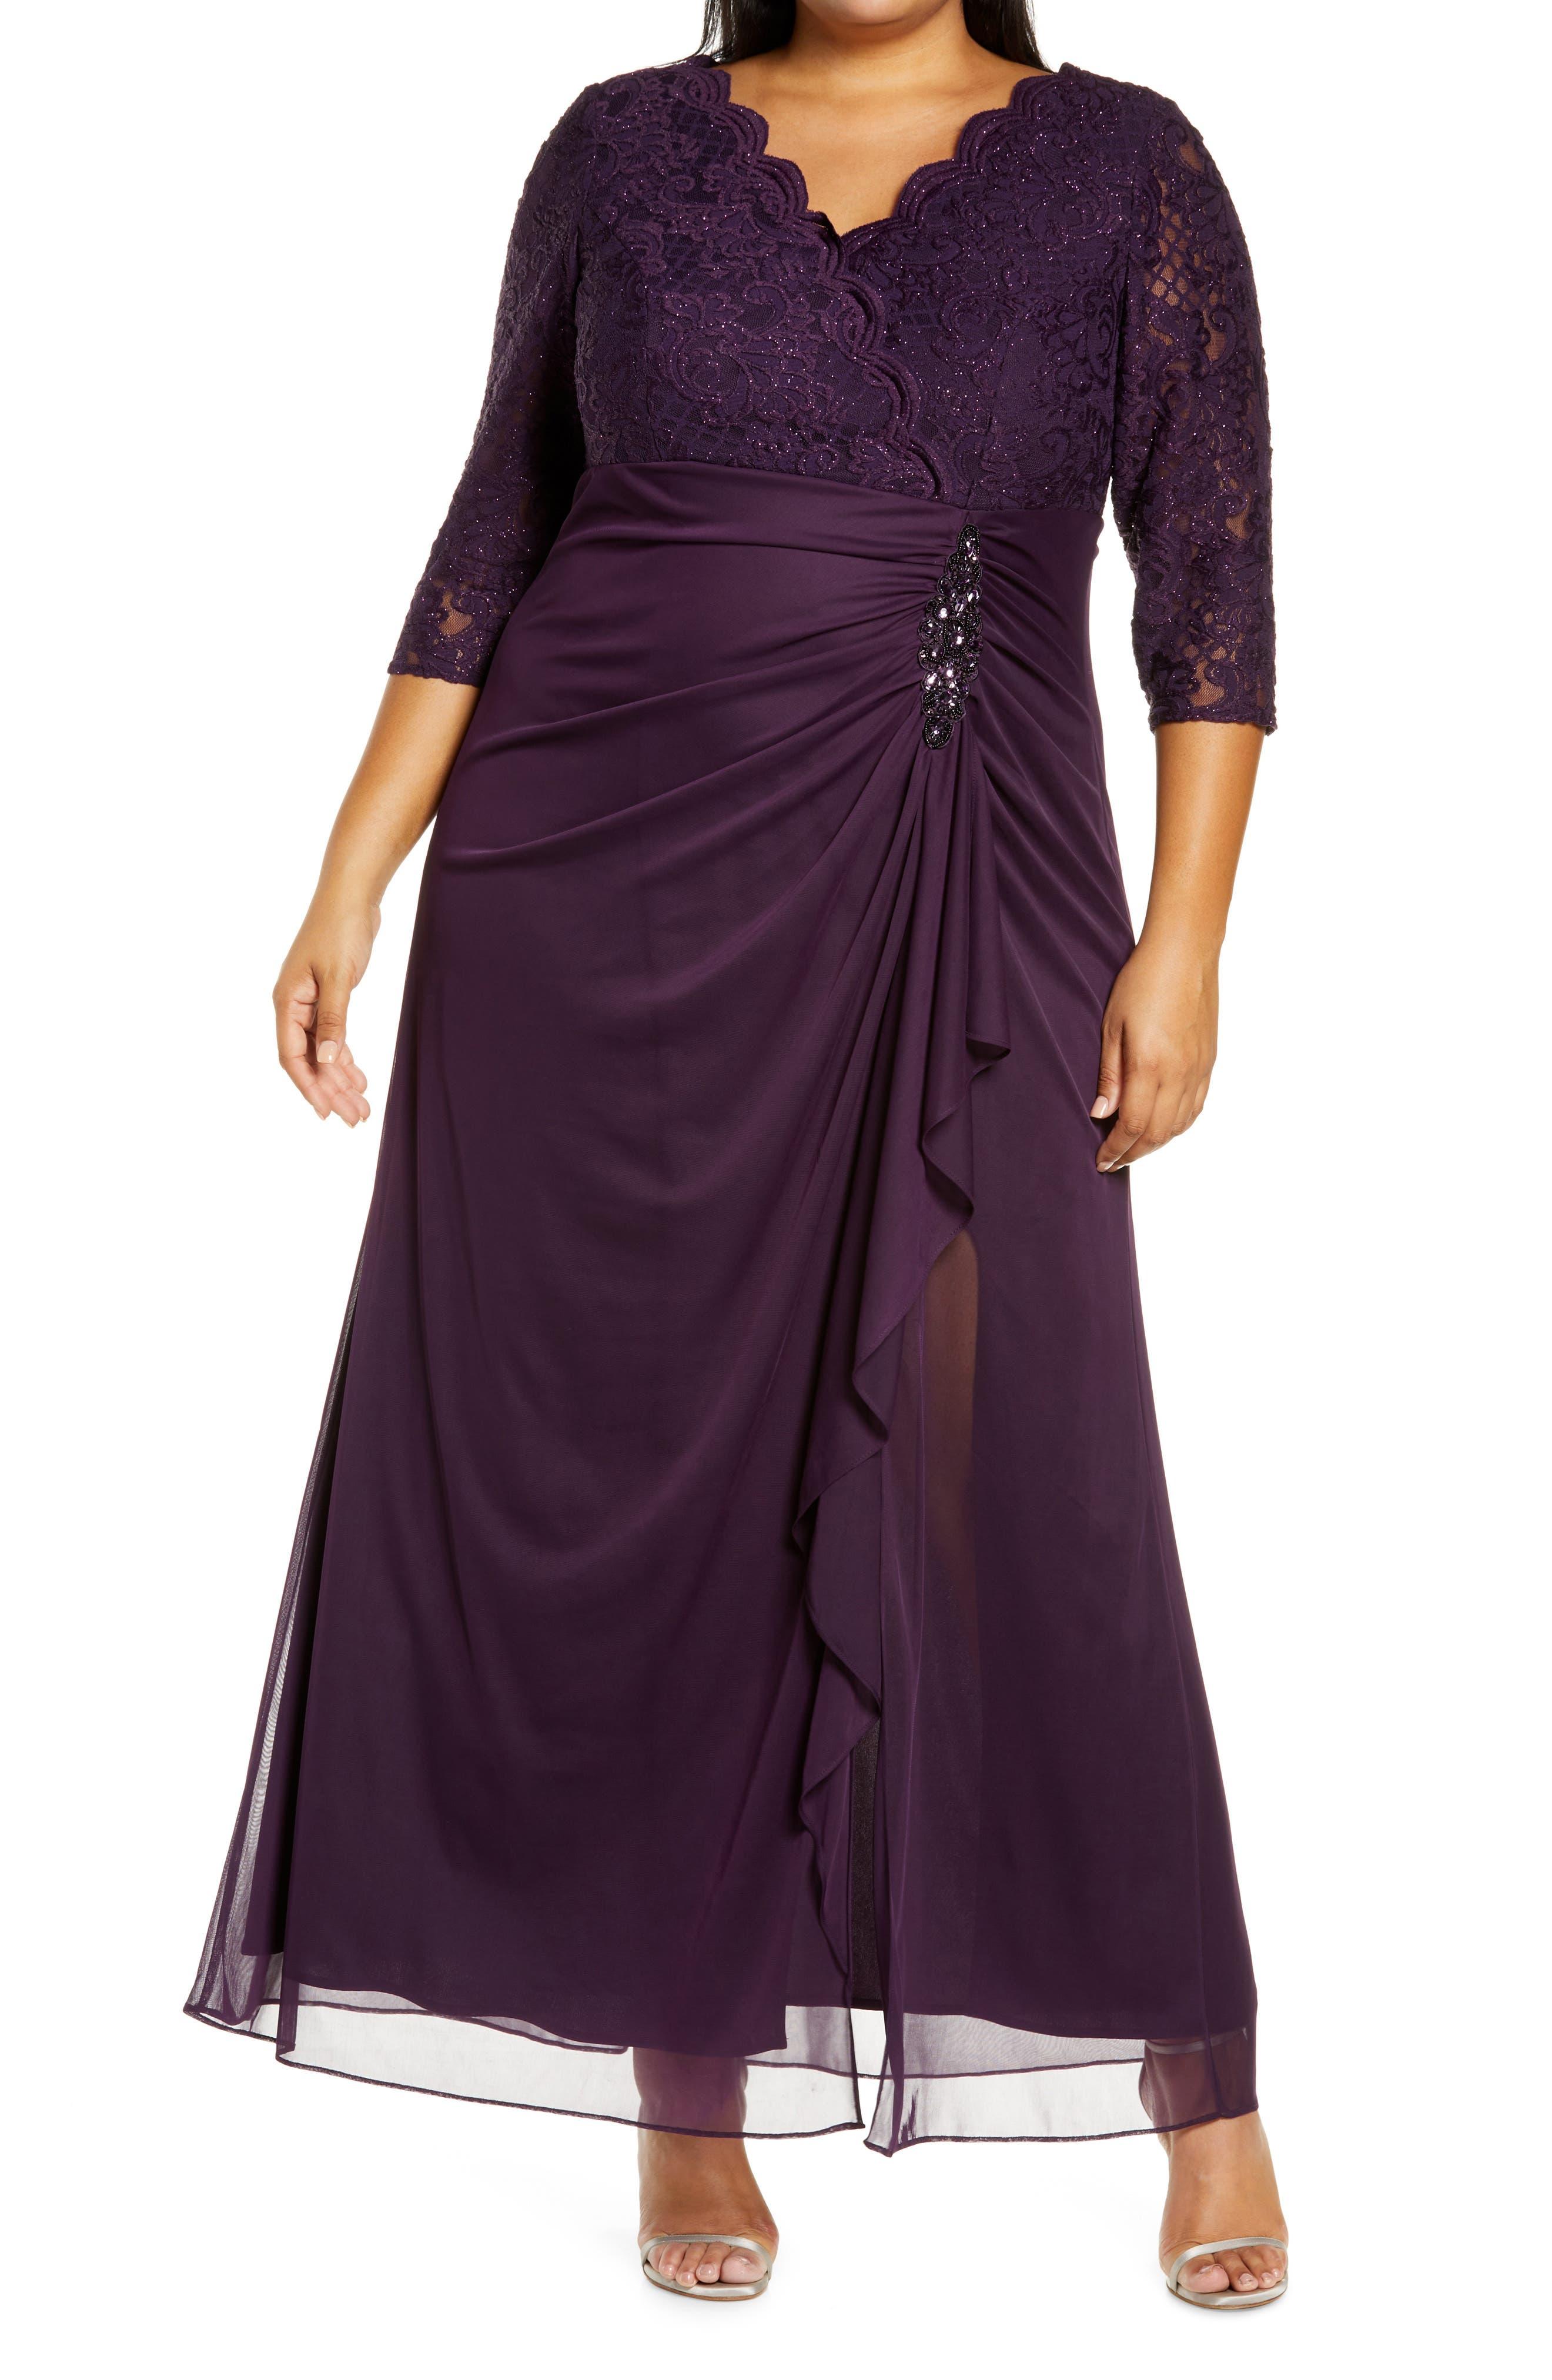 Beaded Lace Bodice Empire Waist Cocktail Dress